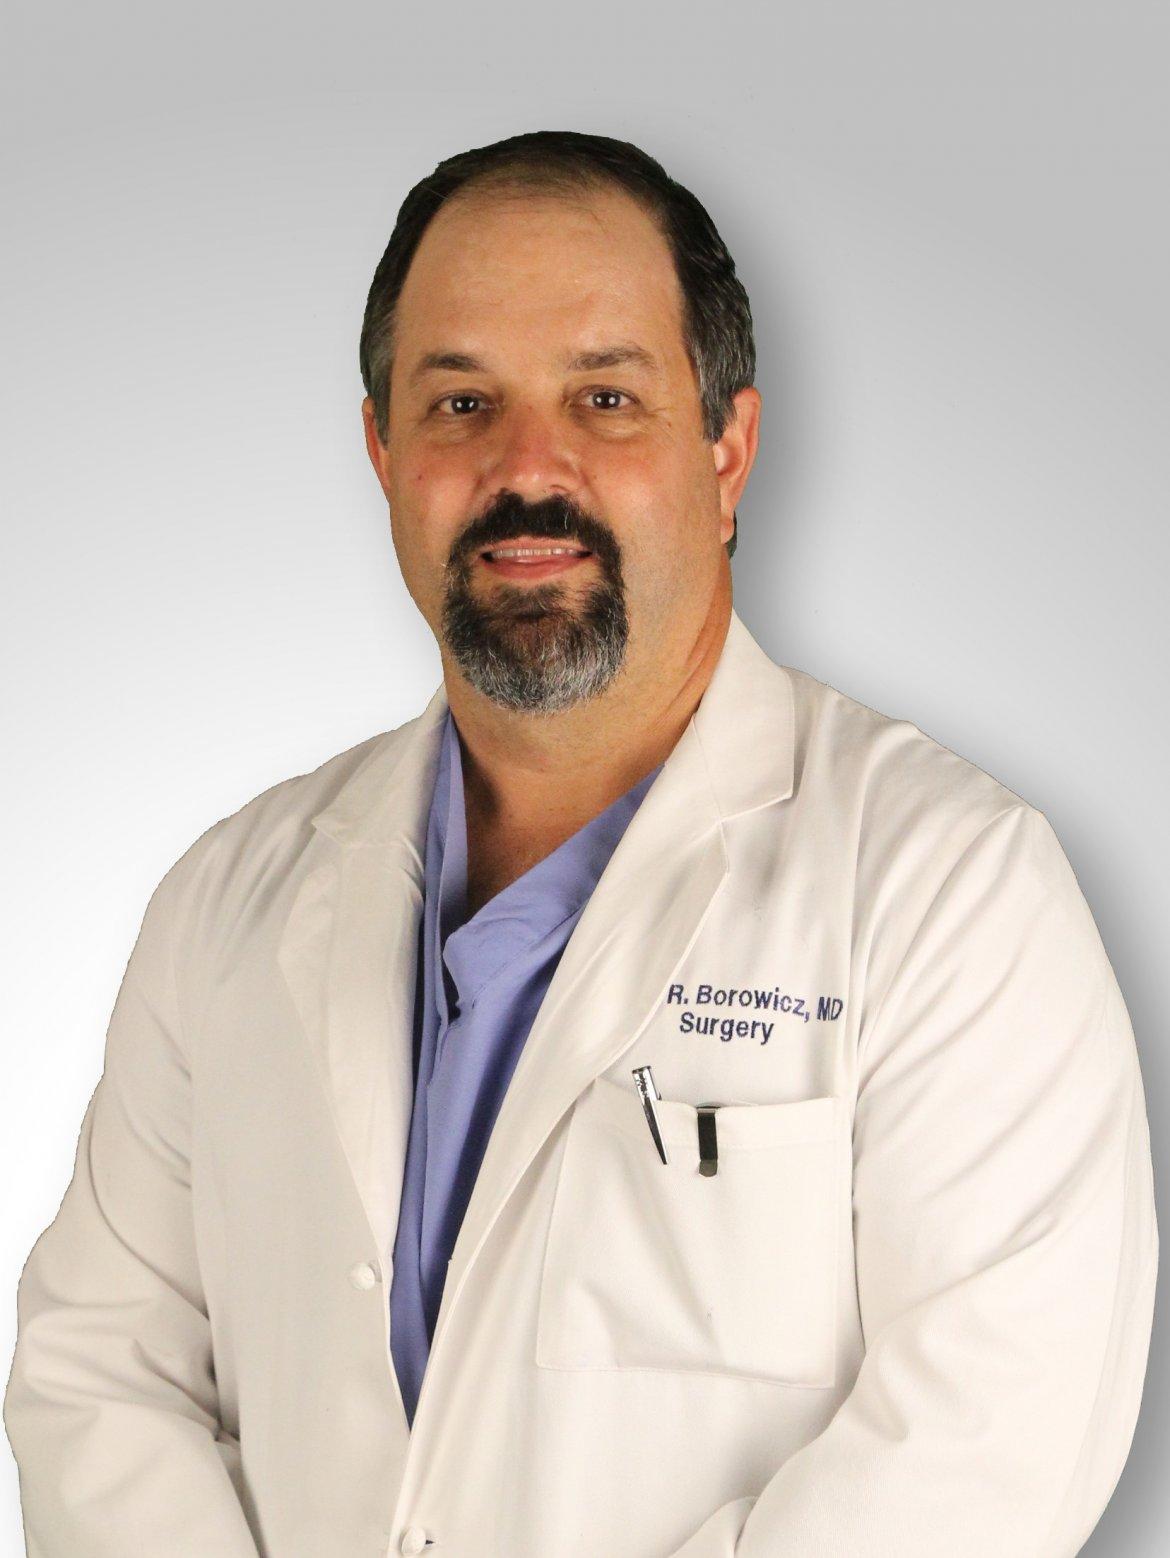 Mark R. Borowicz, MD, FACS